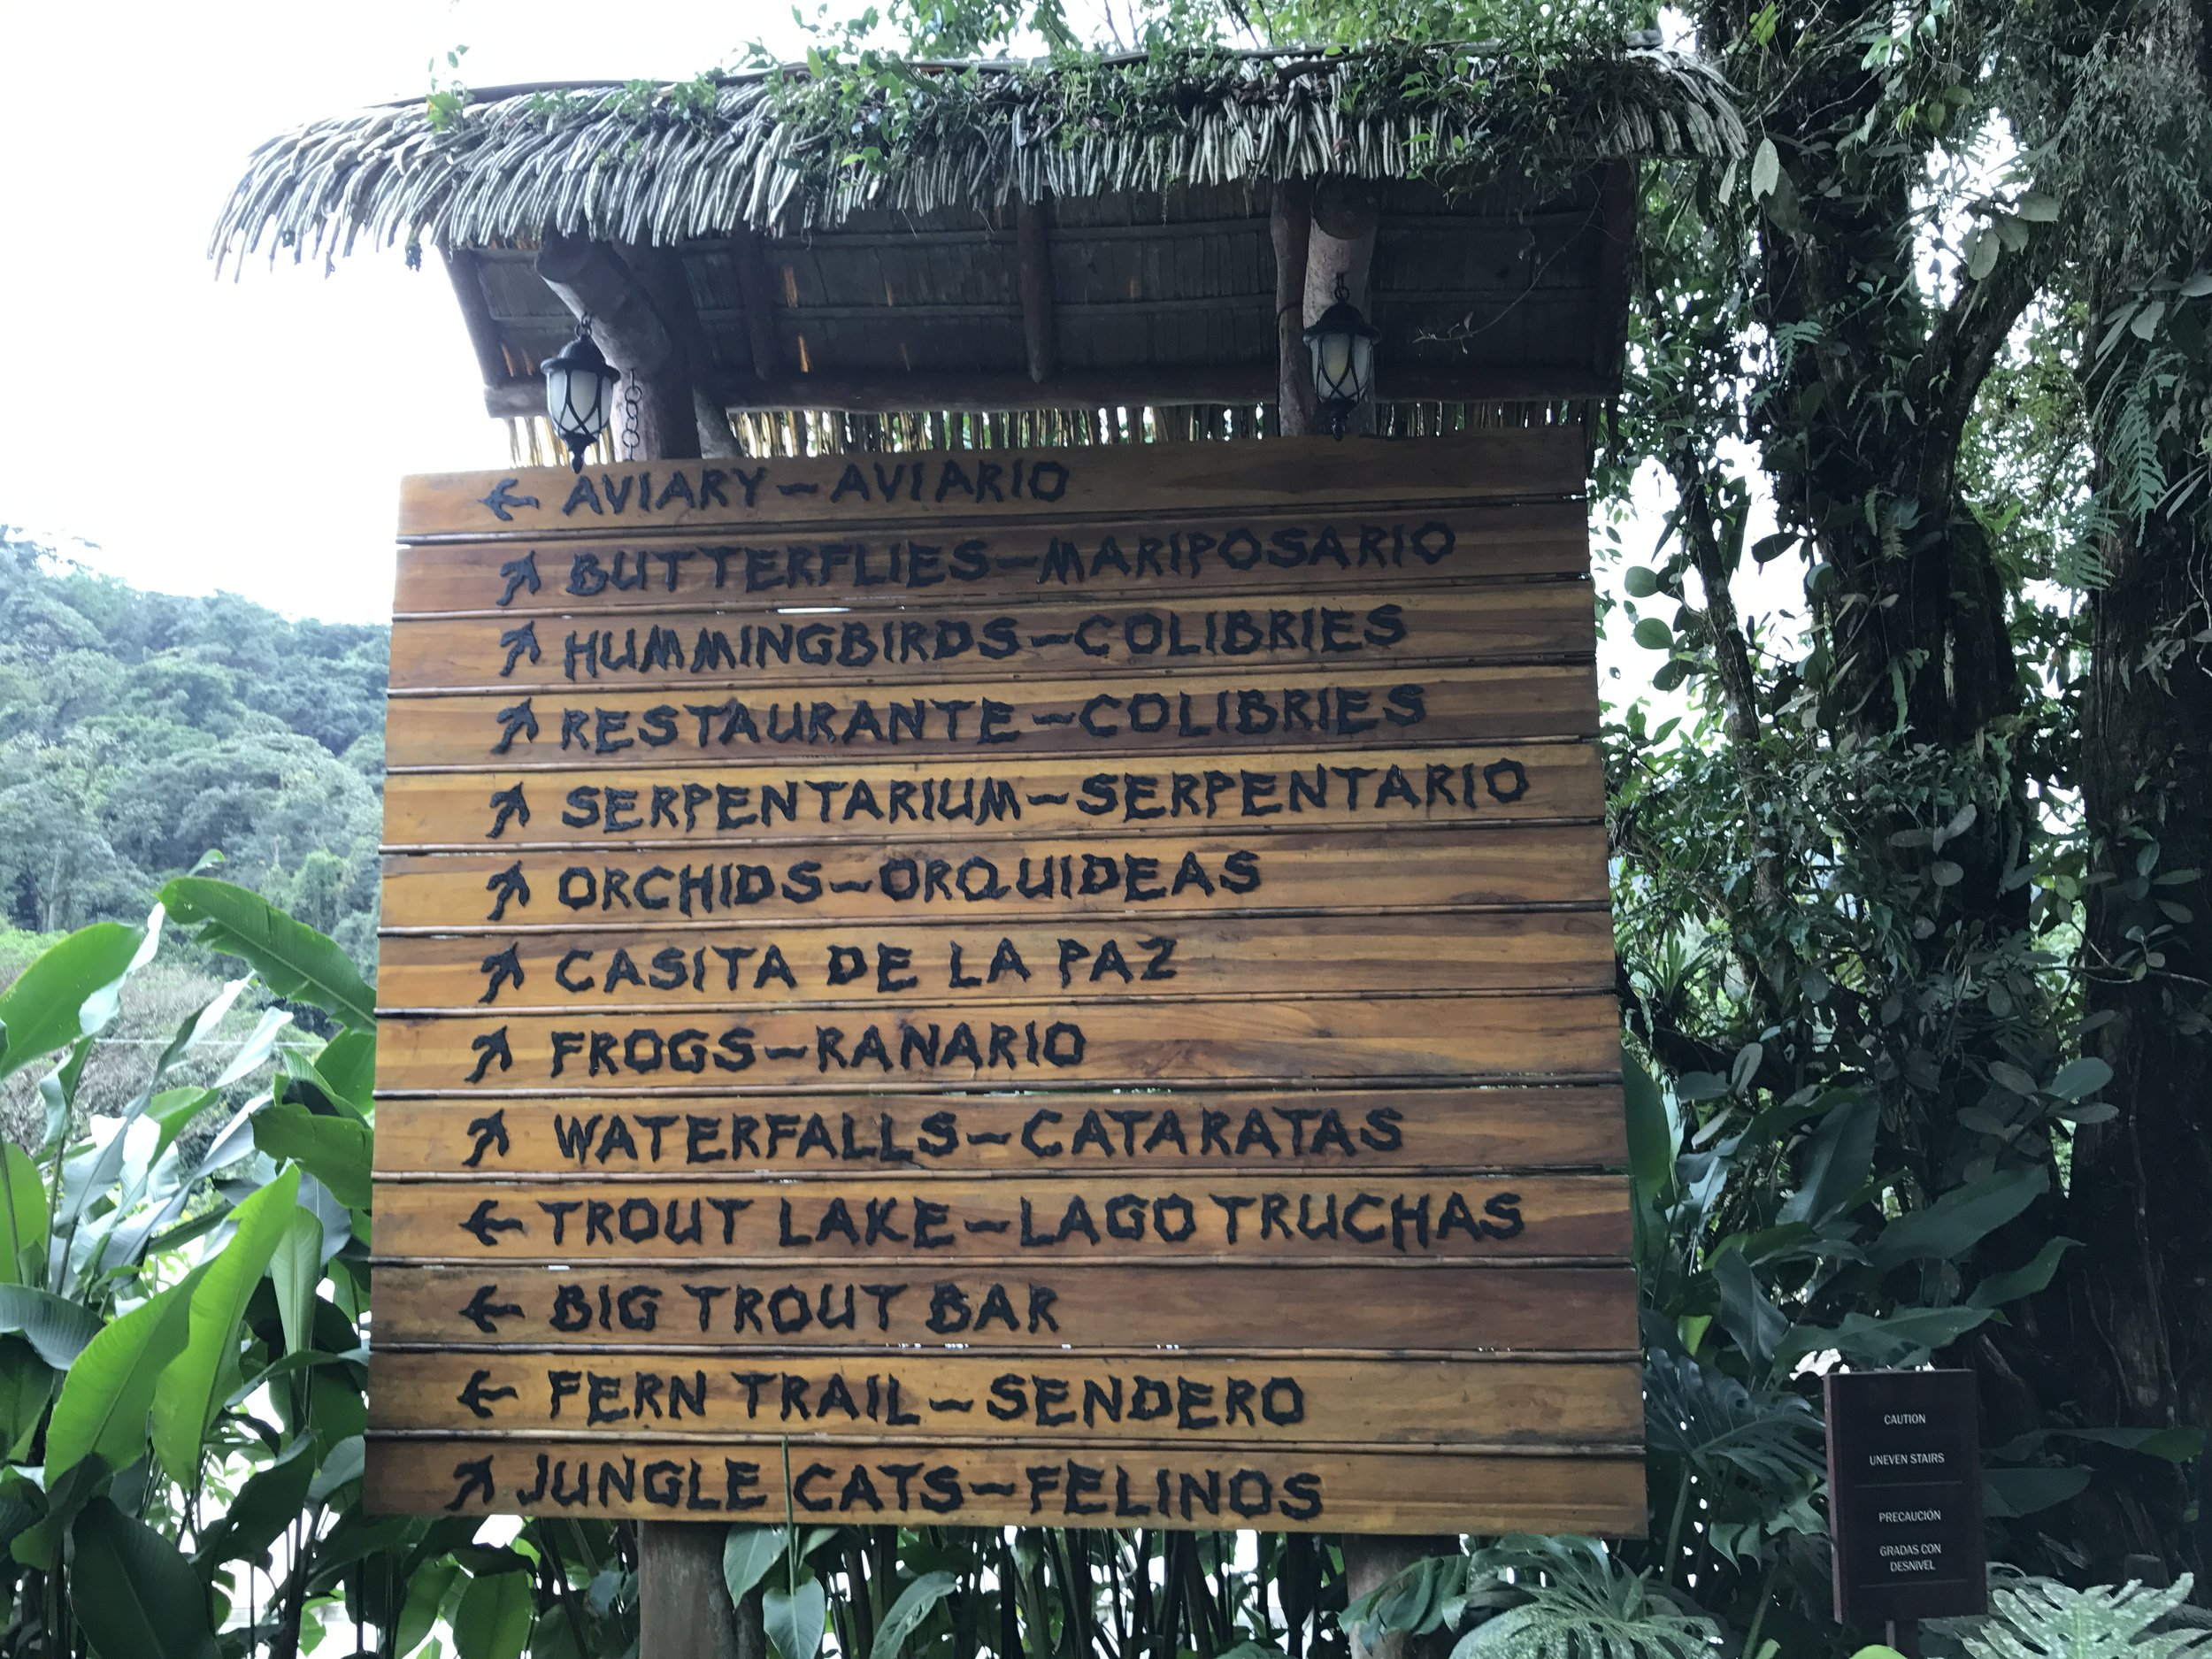 La Paz Waterfall and Animal Sanctuary